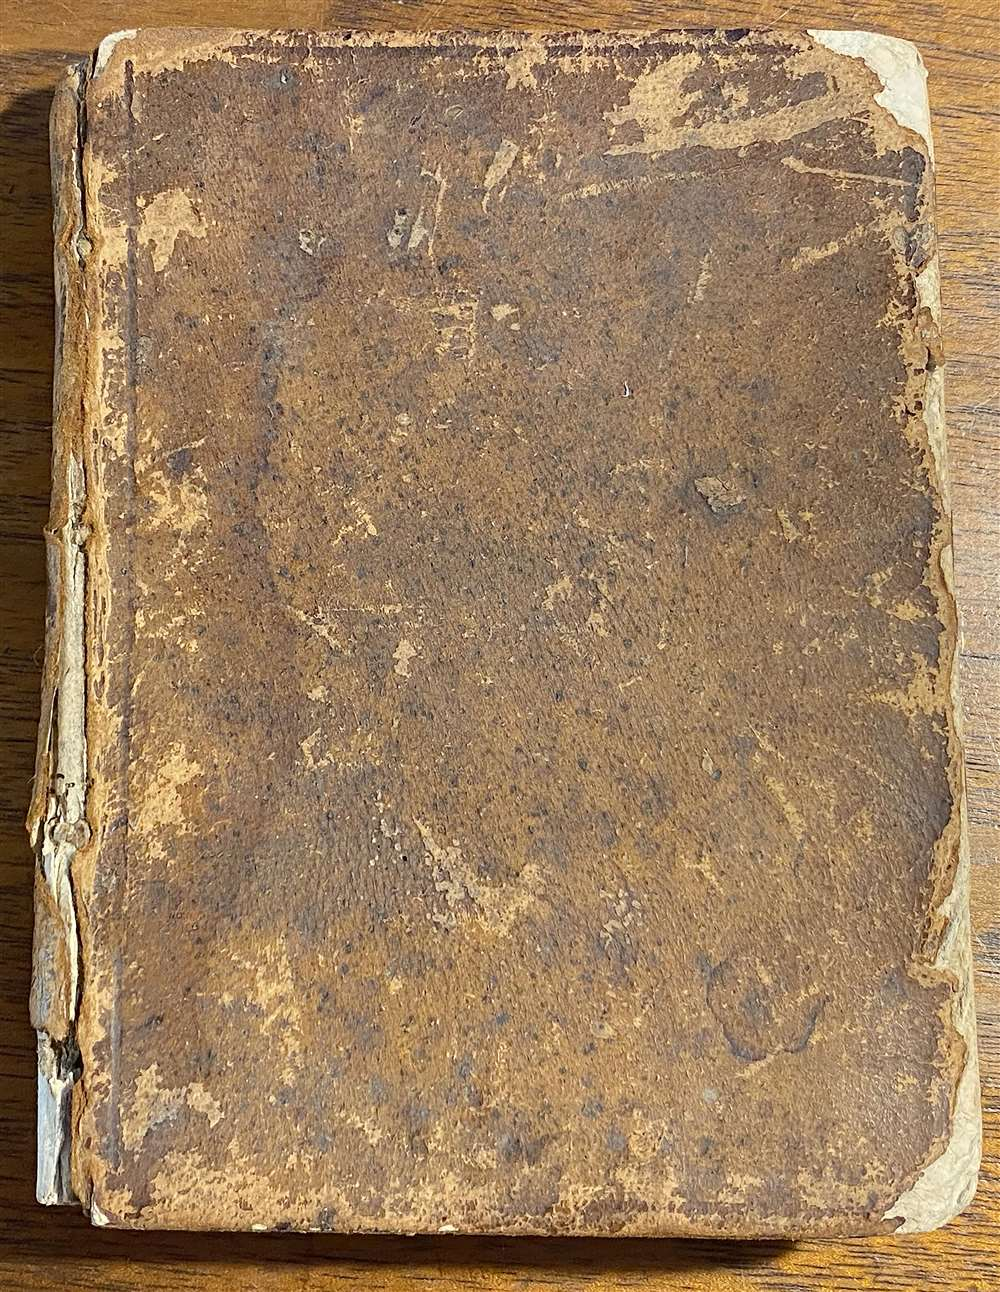 [Untitled Manuscript Pocket Atlas] - Alternate View 9